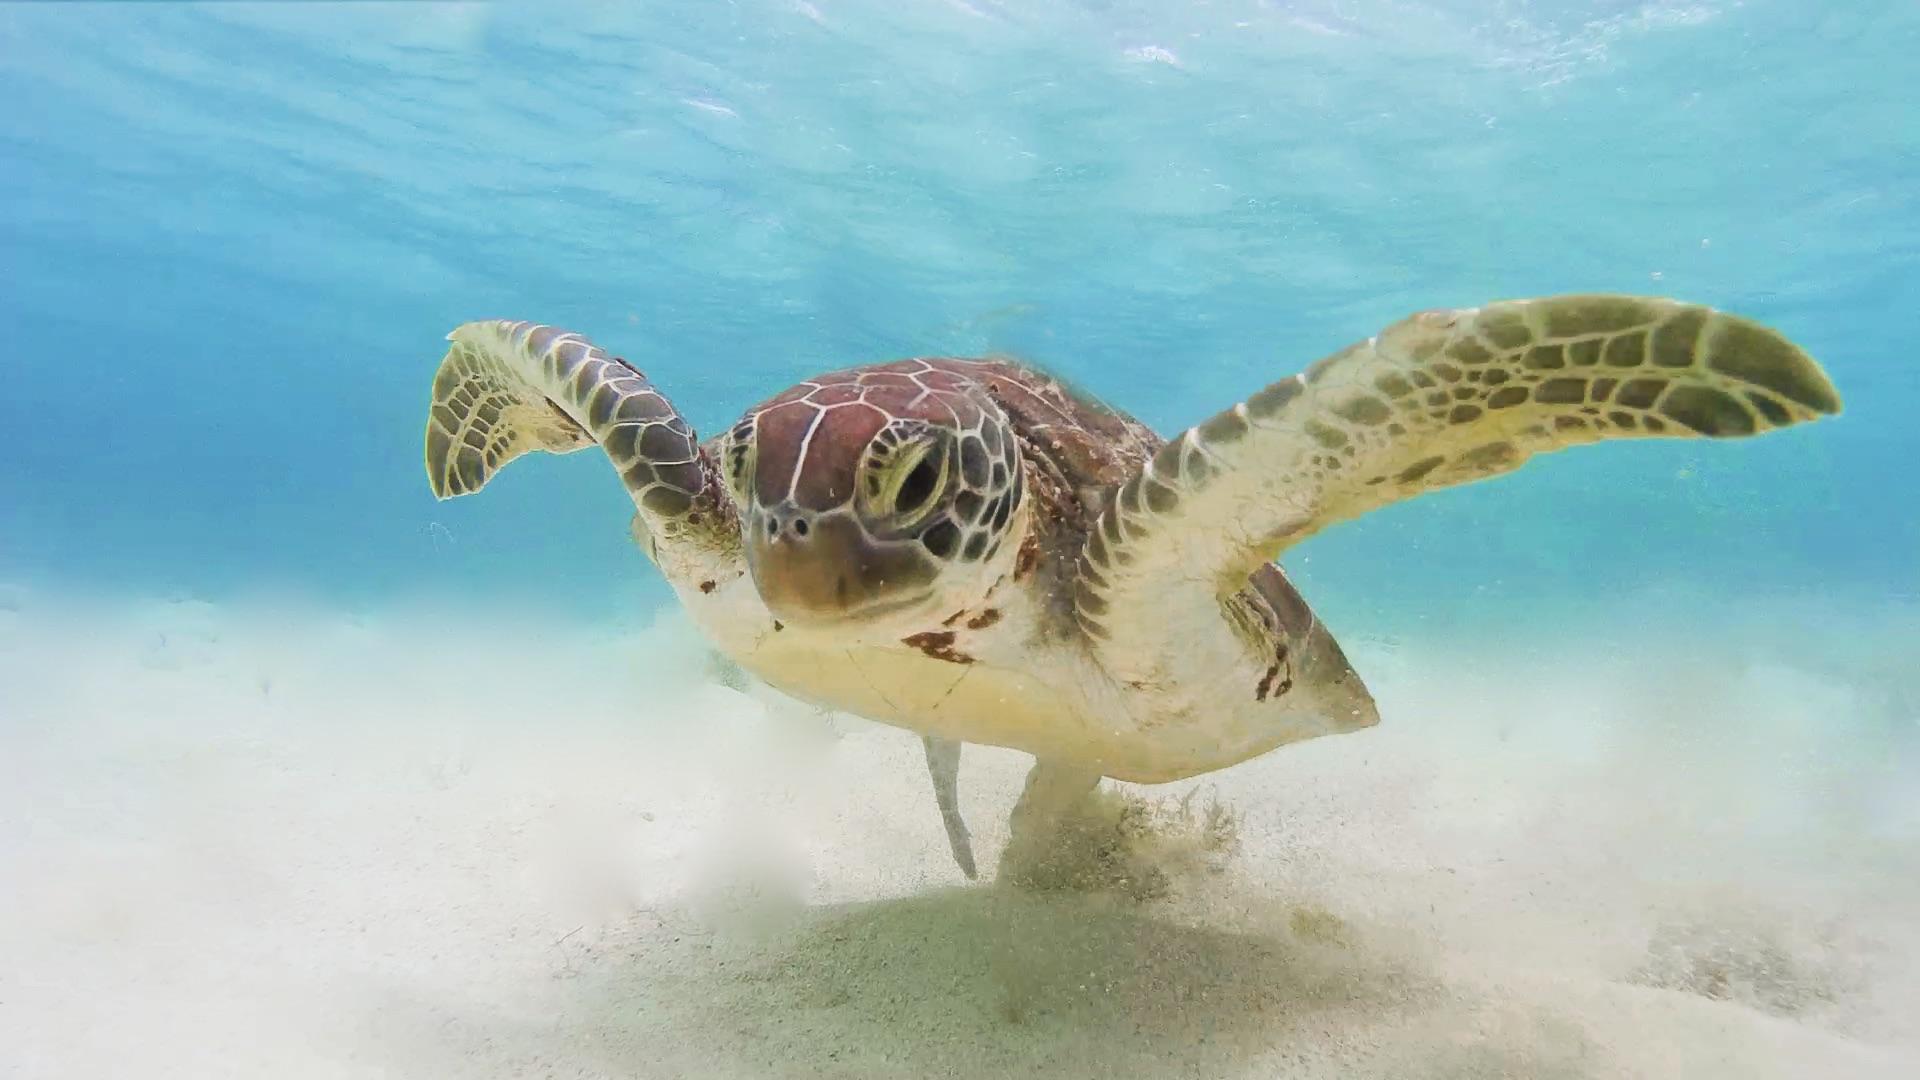 Tortue marine - Snorkeling à l'île de la petite terre - guadeloupe